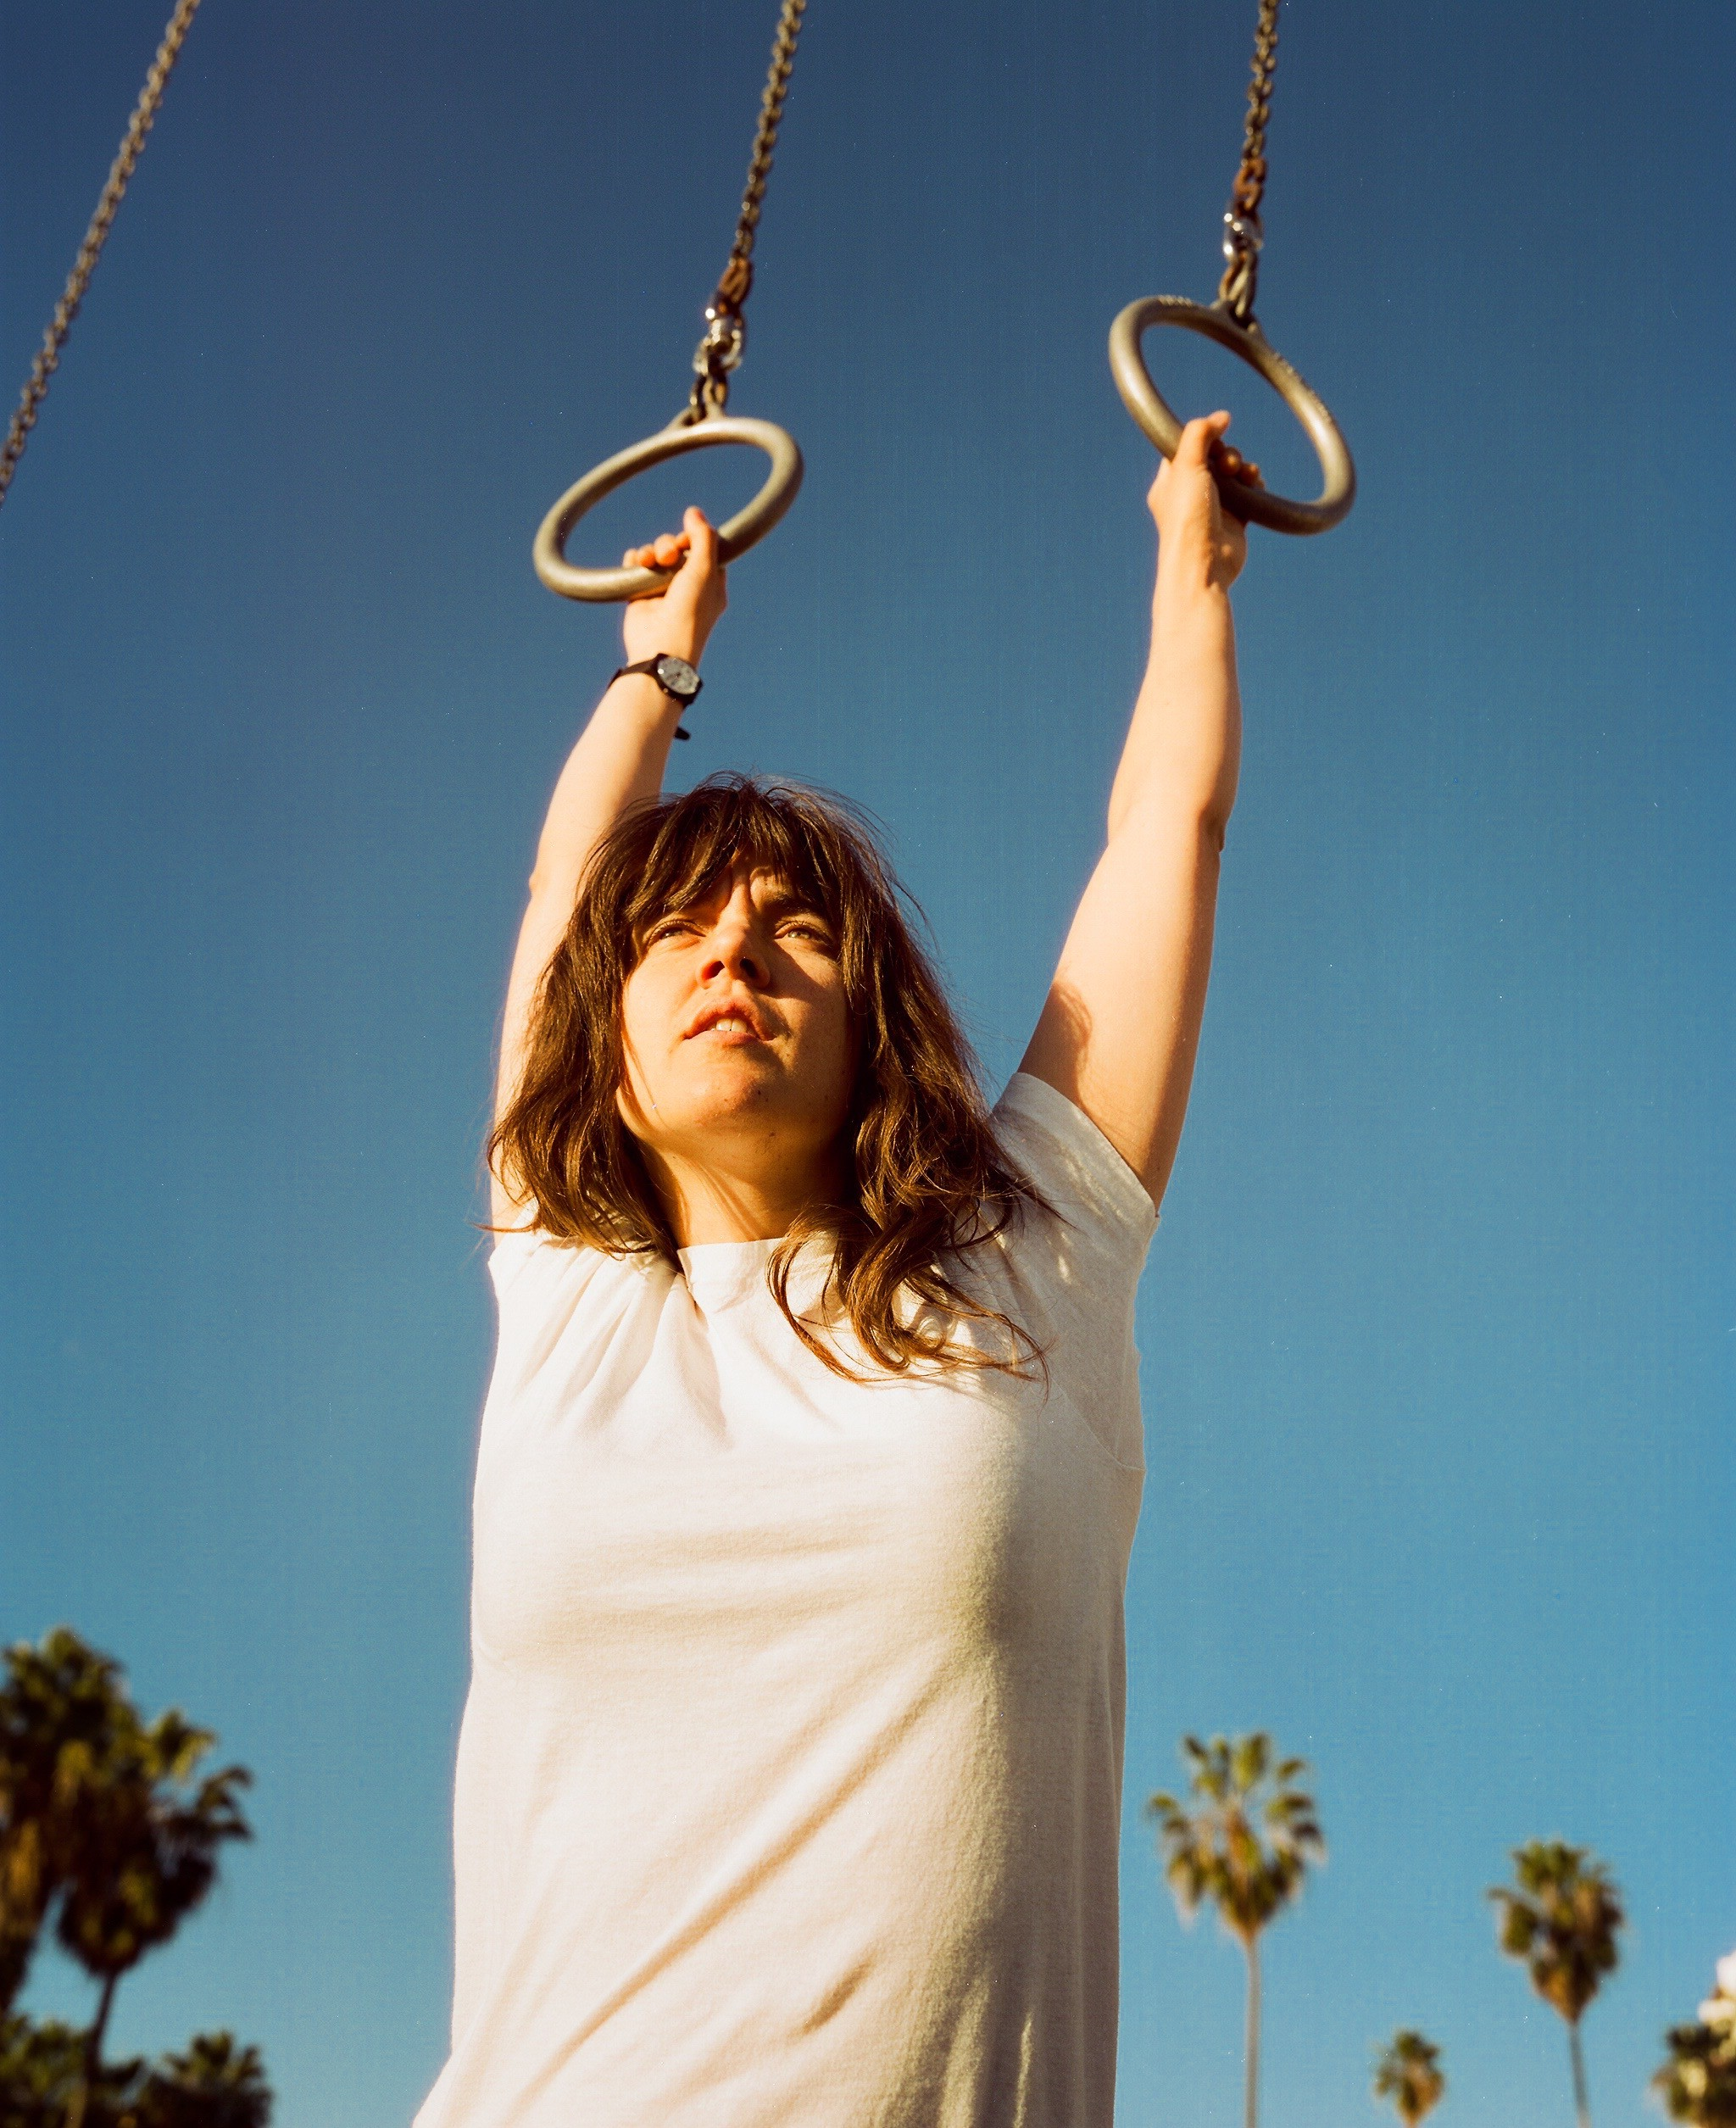 Hear Courtney Barnett's breezy new track 'City Looks Pretty'